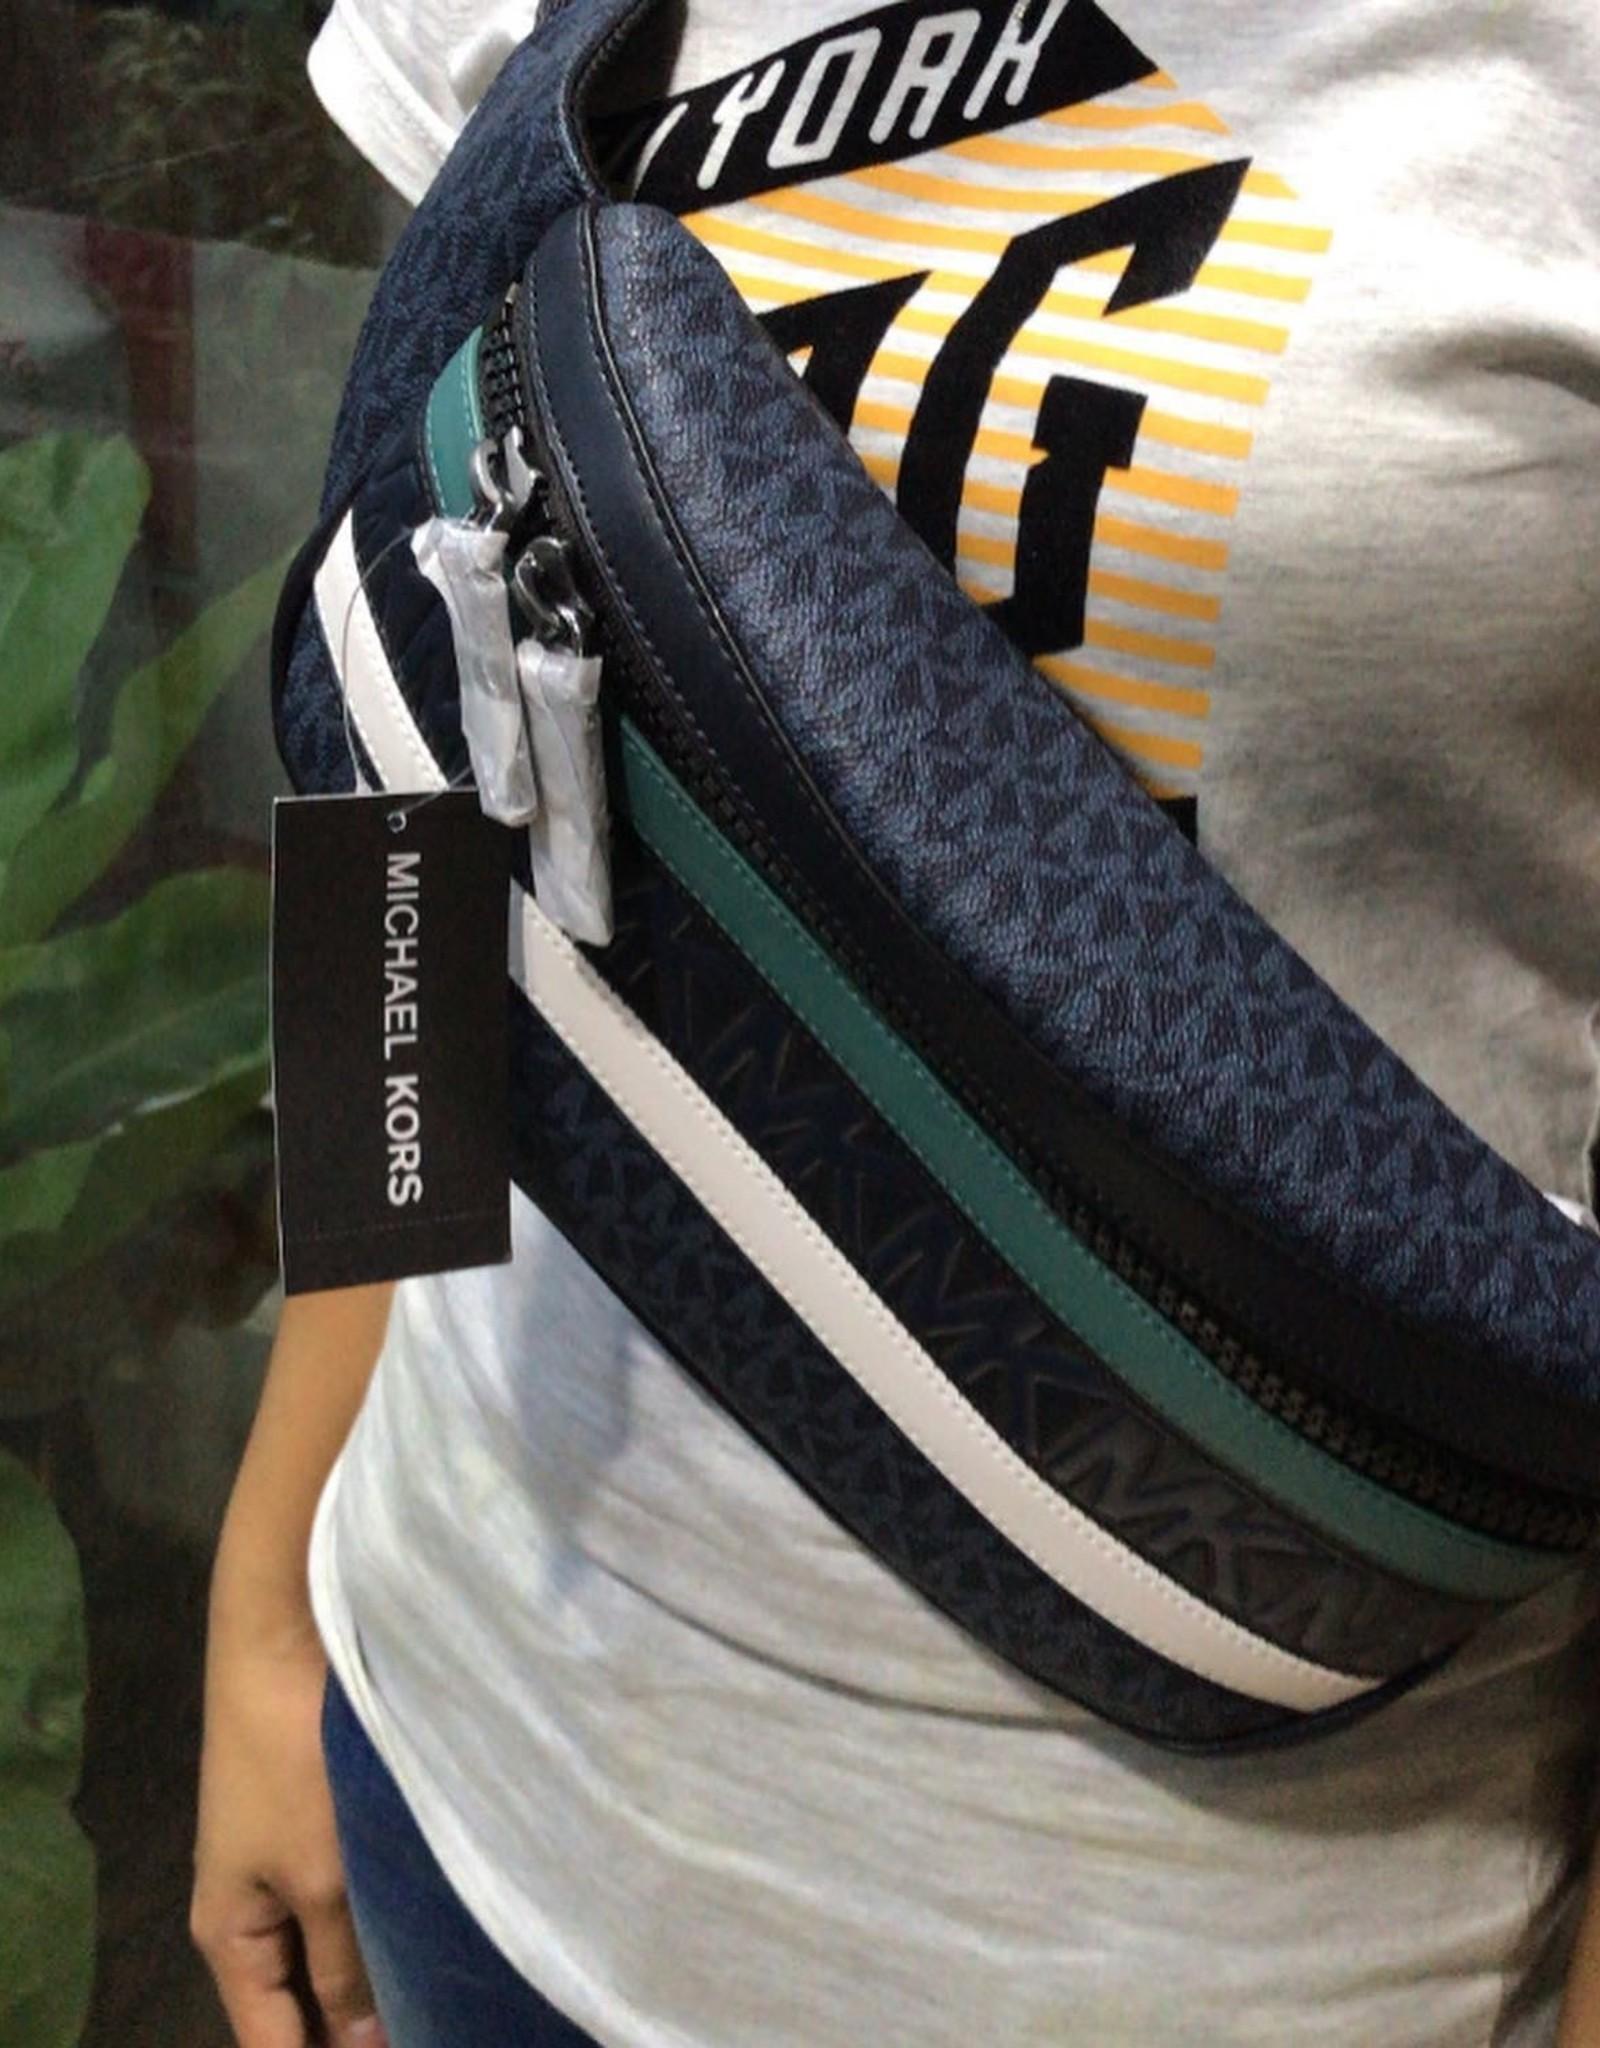 Michael Kors Michael Kors Belt Bag